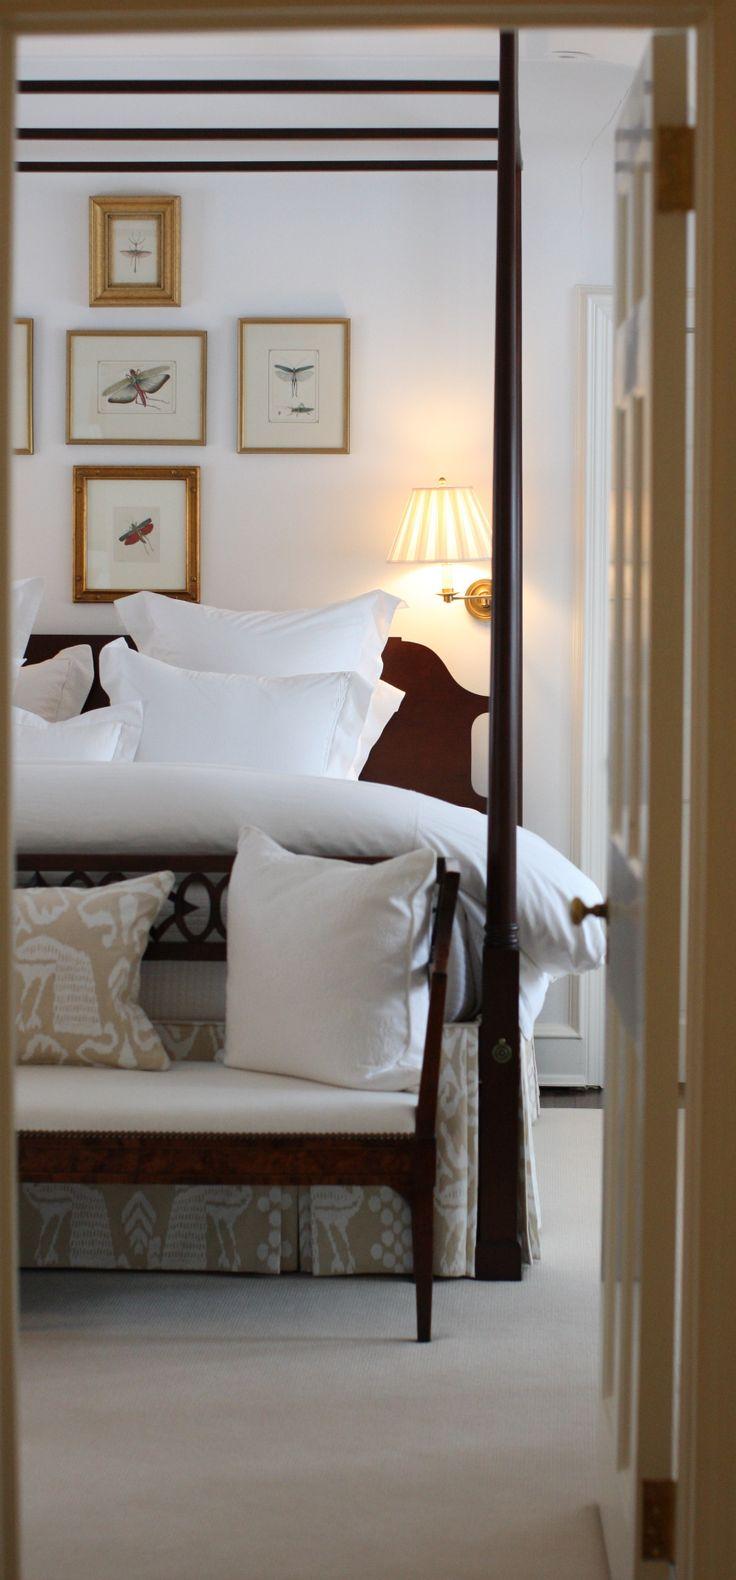 Pottery Barn Bedrooms 229 Best Bedrooms Images On Pinterest Bedrooms Master Bedrooms